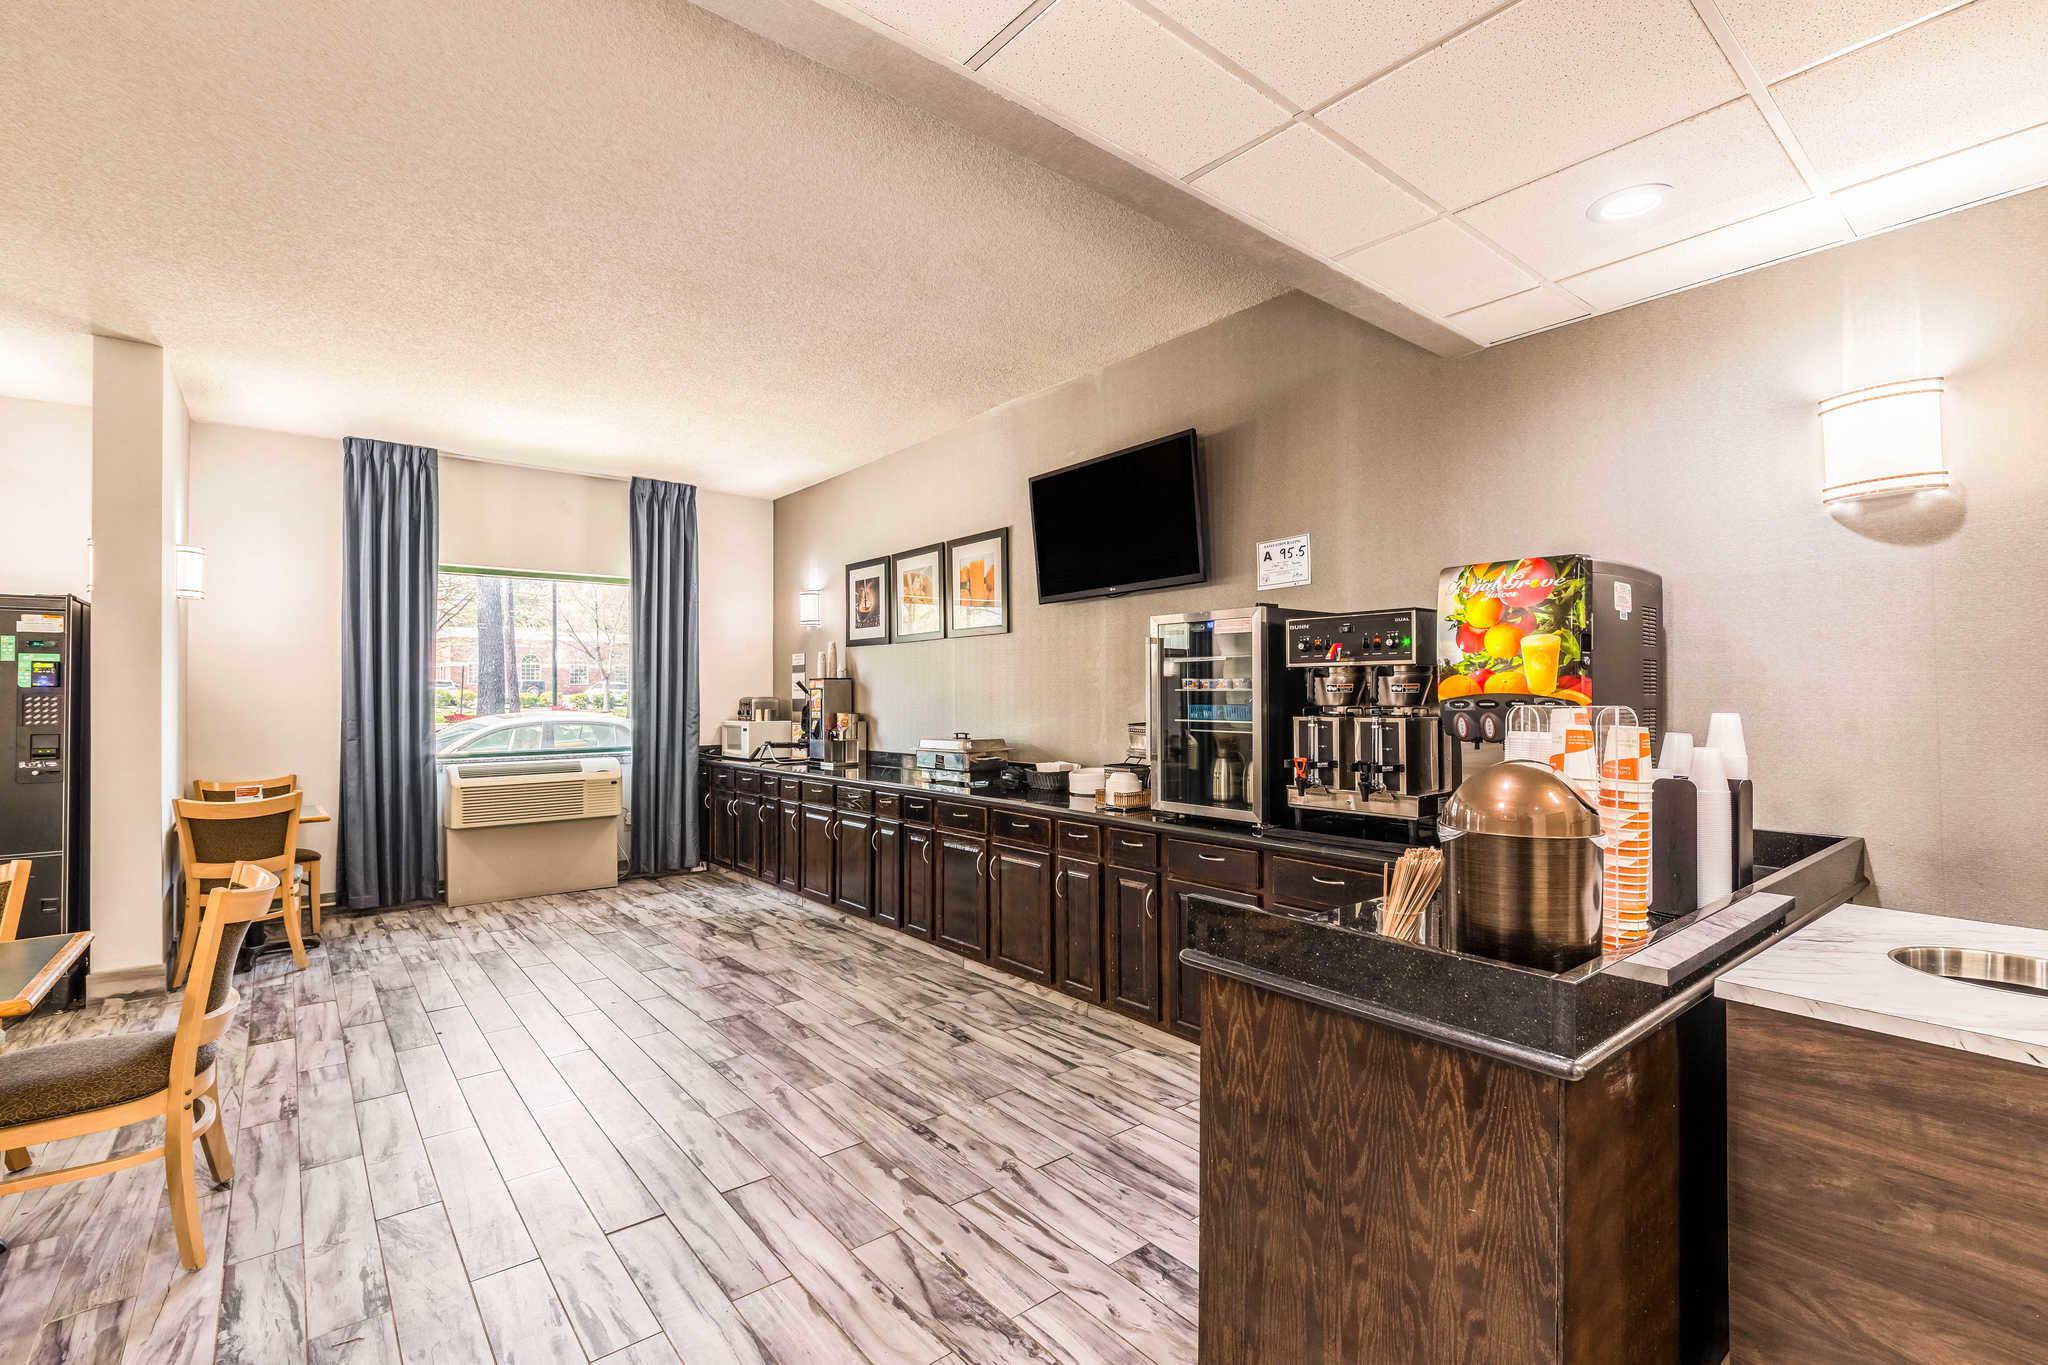 Clarion Inn & Suites image 36